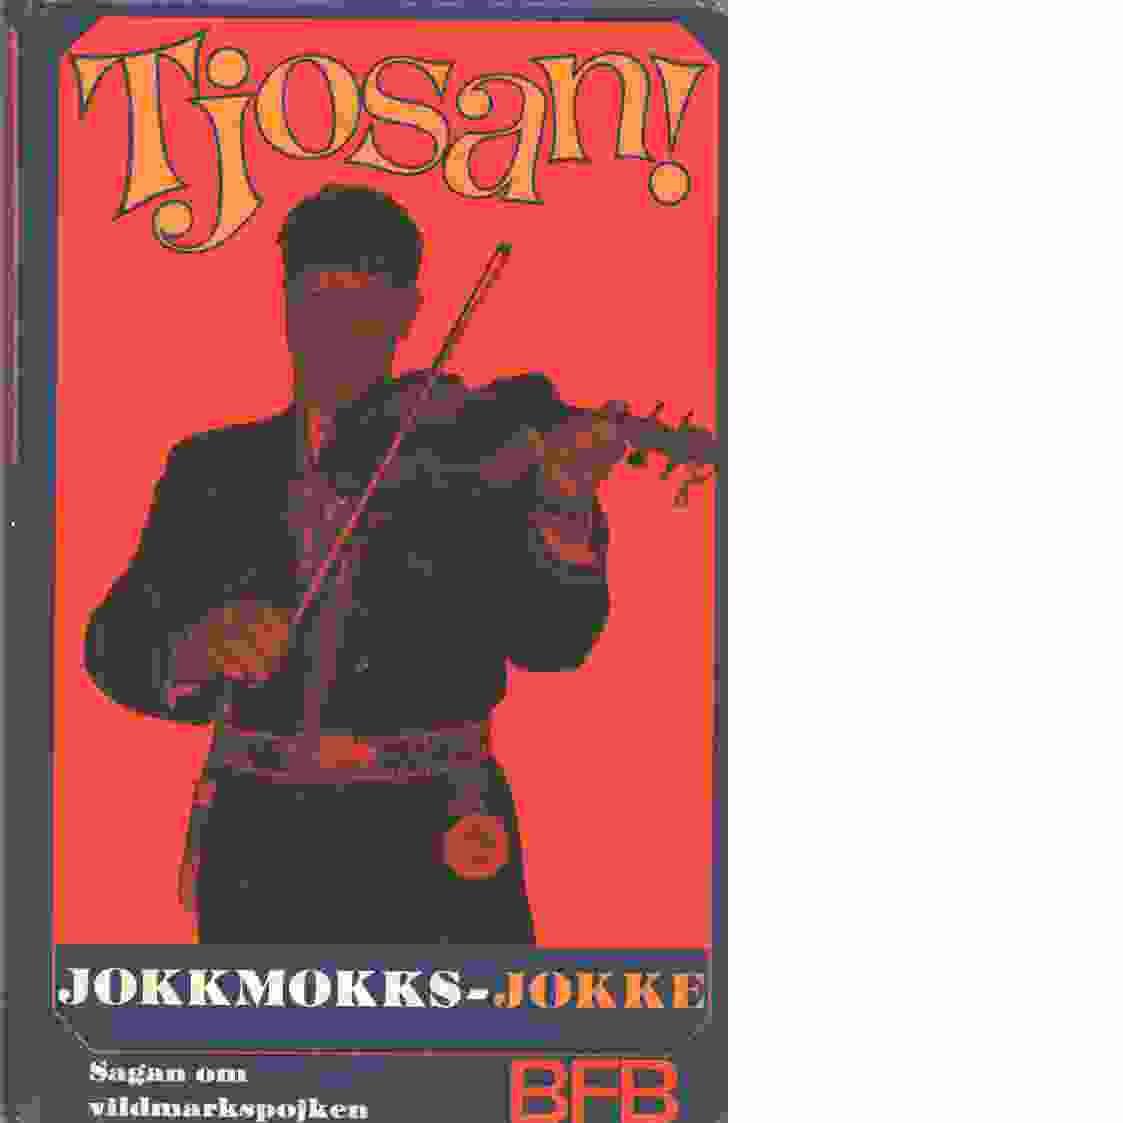 Tjosan! : [sagan om vildmarkspojken] - Jokkmokks-Jokke